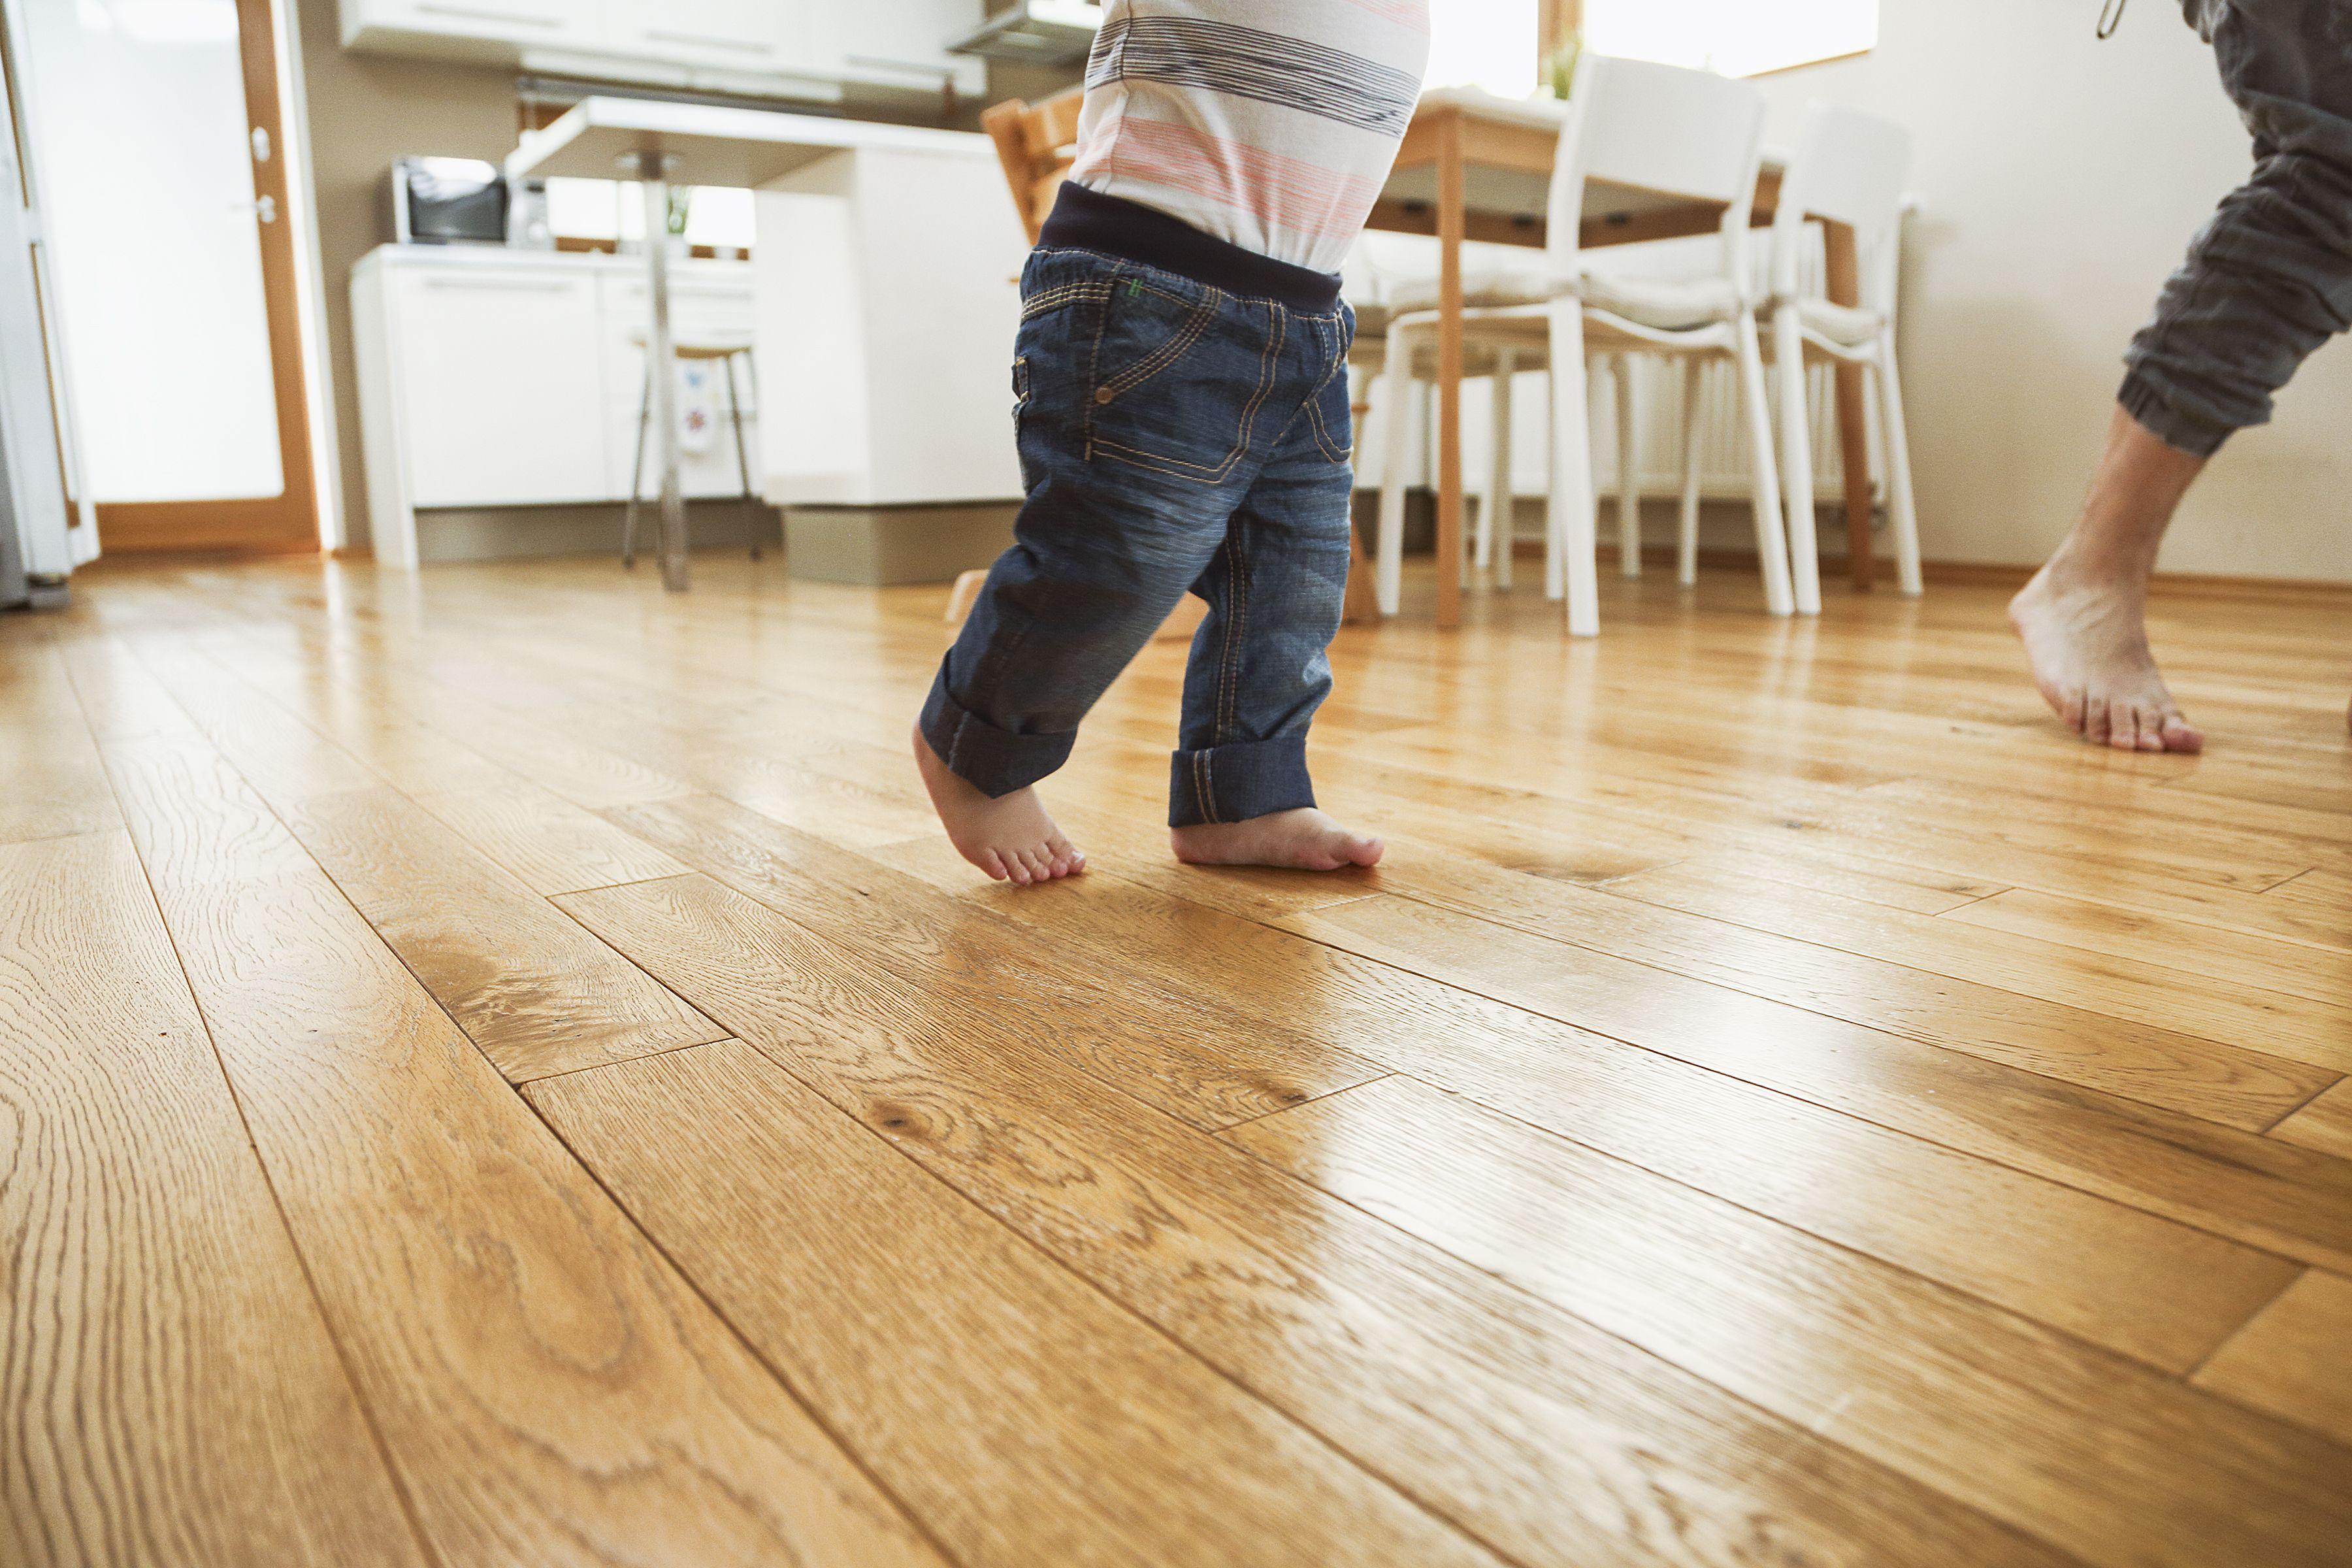 Toddler walking full steam ahead